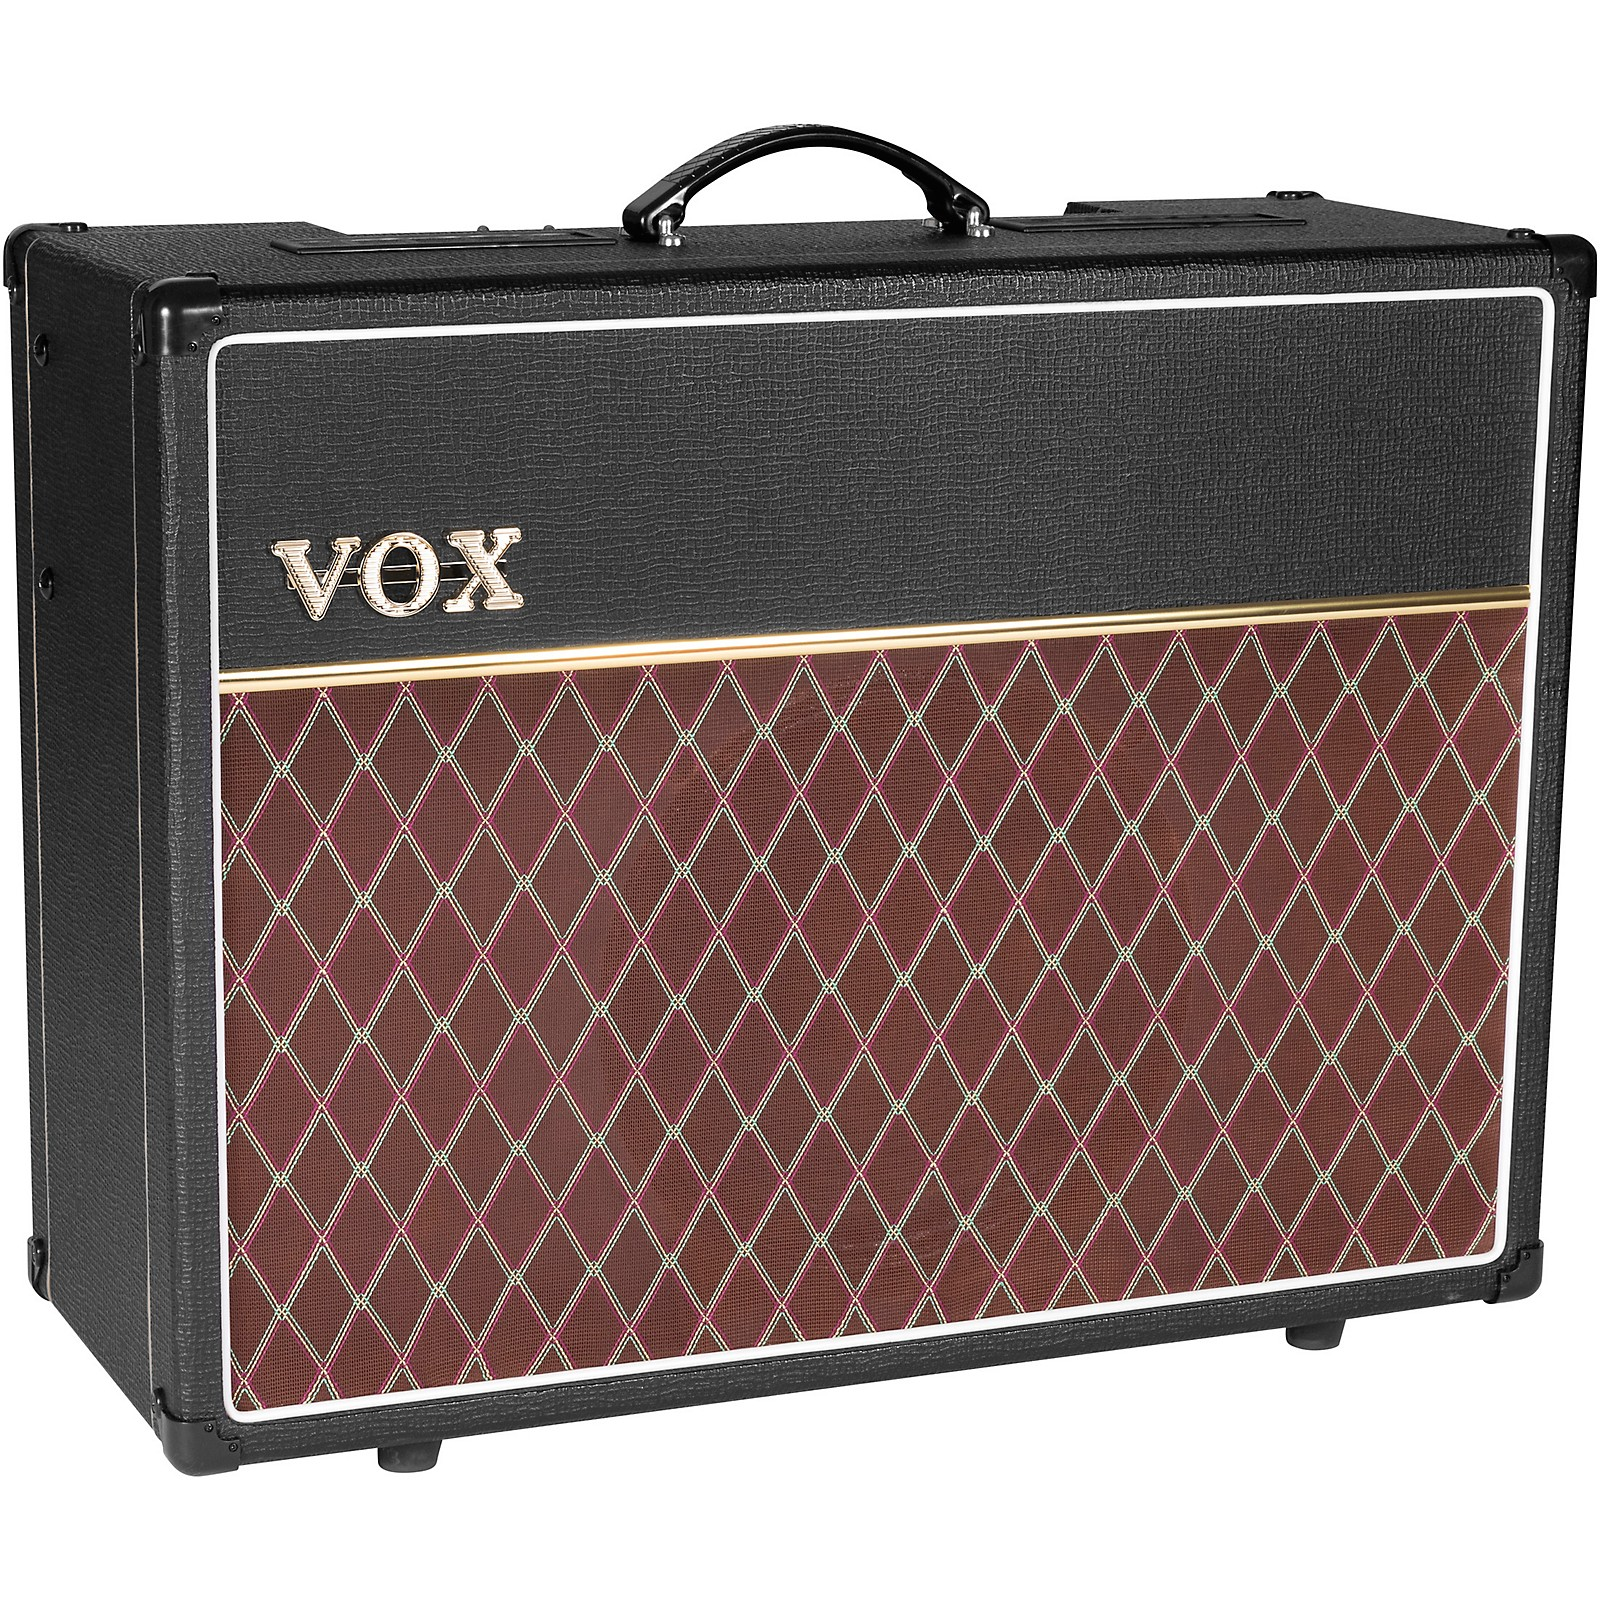 Open Box Vox AC30S1 30W 1x12 Tube Guitar Combo Amp